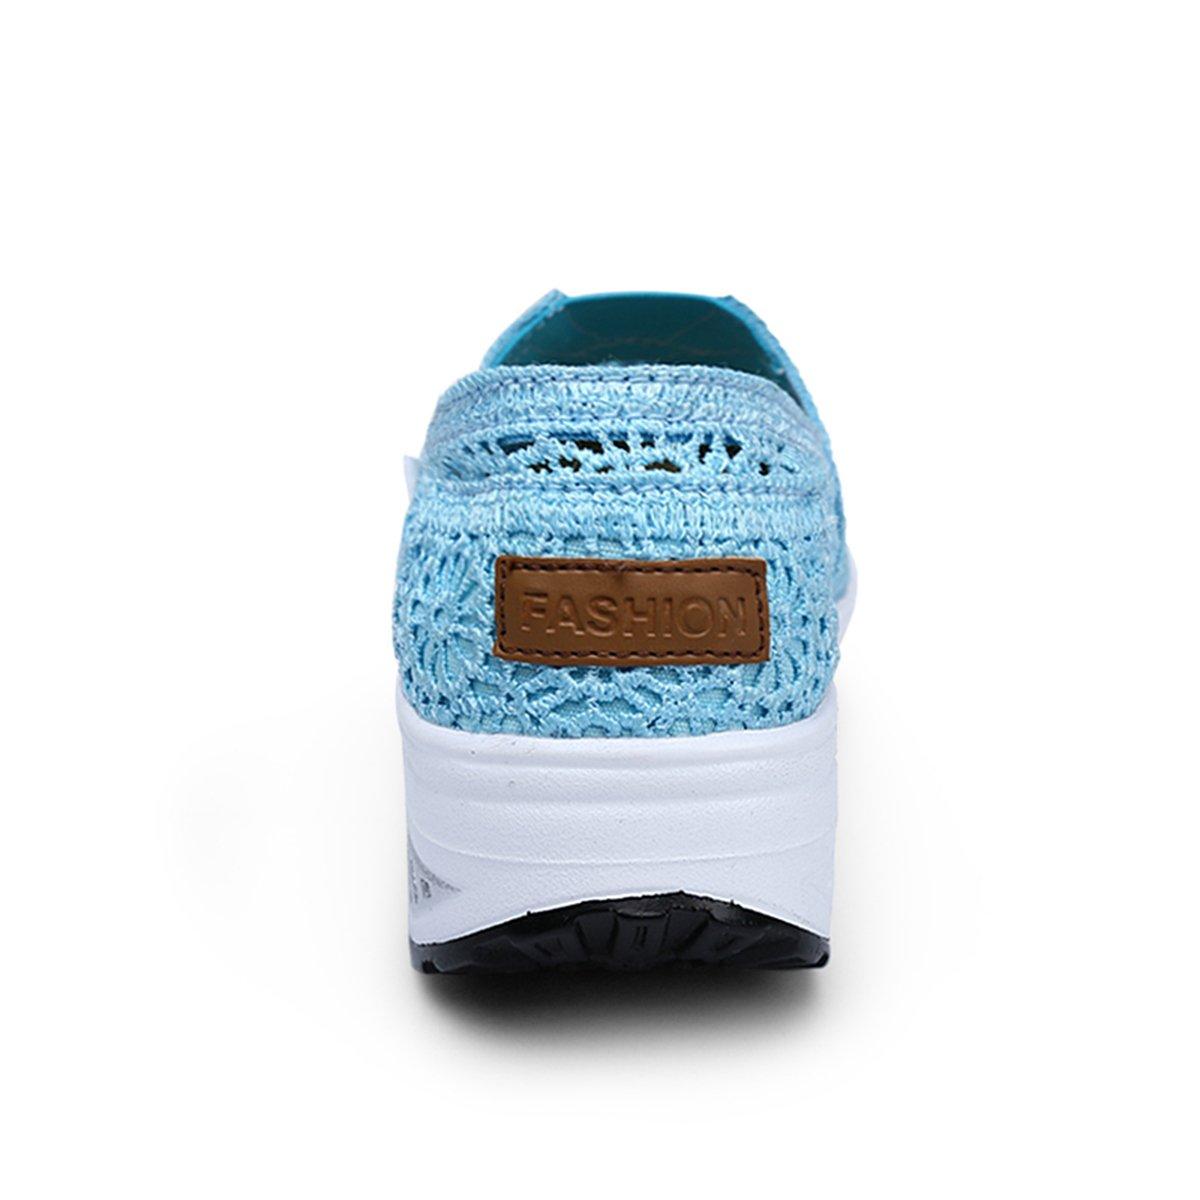 Netz Keilabsatz Plateau Wedges Freizeitschuhe Sneaker Keilabsatz Netz Atmungsaktiv Slip on Mesh-oberfläche Schuhe Laufschuhe Sommer Loafers Damen A-hellblau 011f24